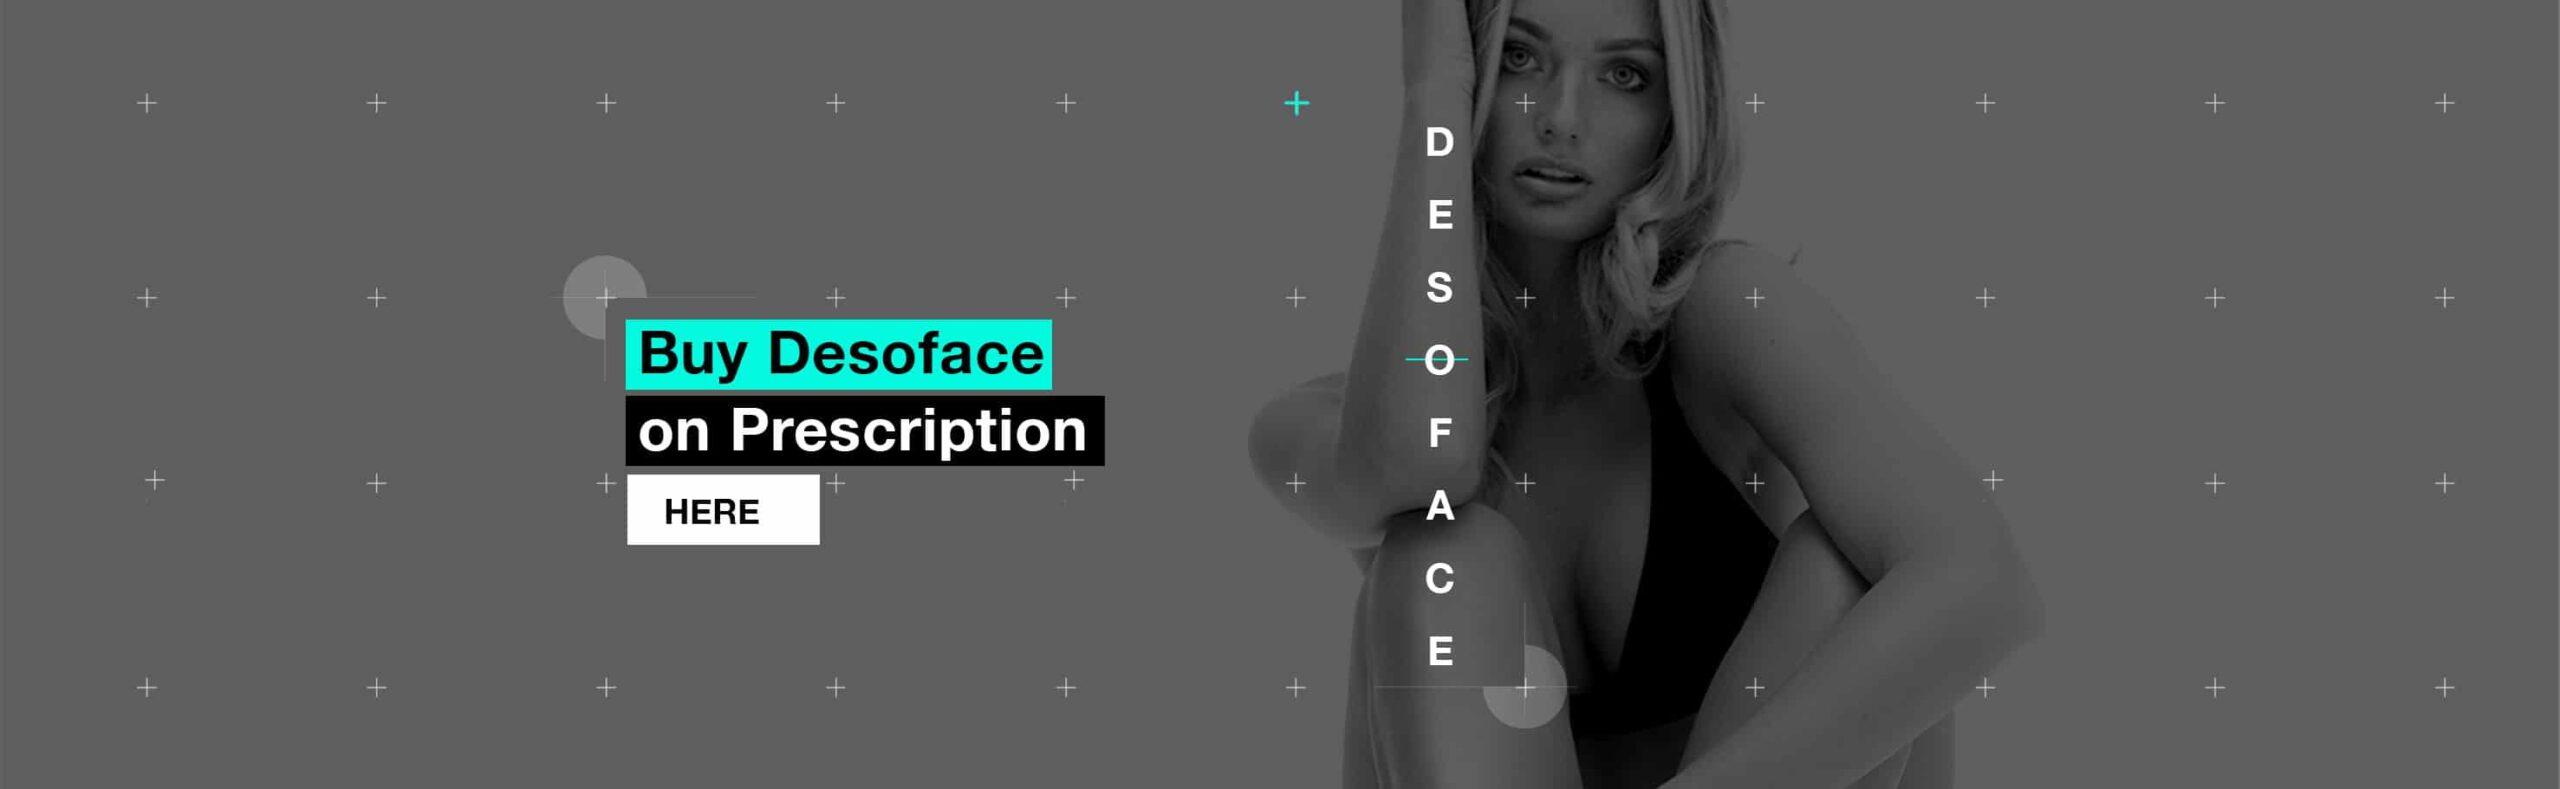 Buy Desoface on prescription